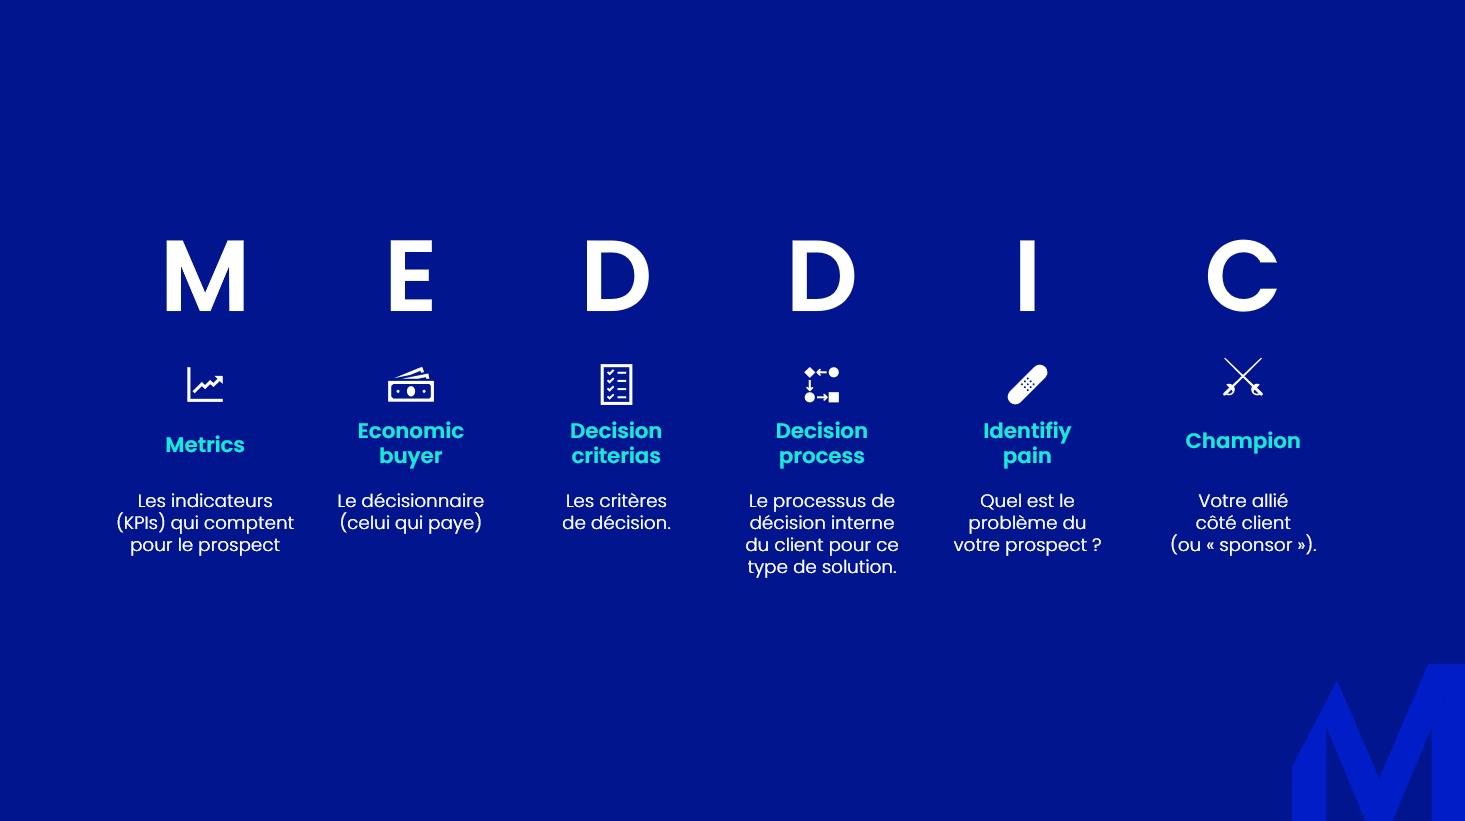 MEDDIC concept